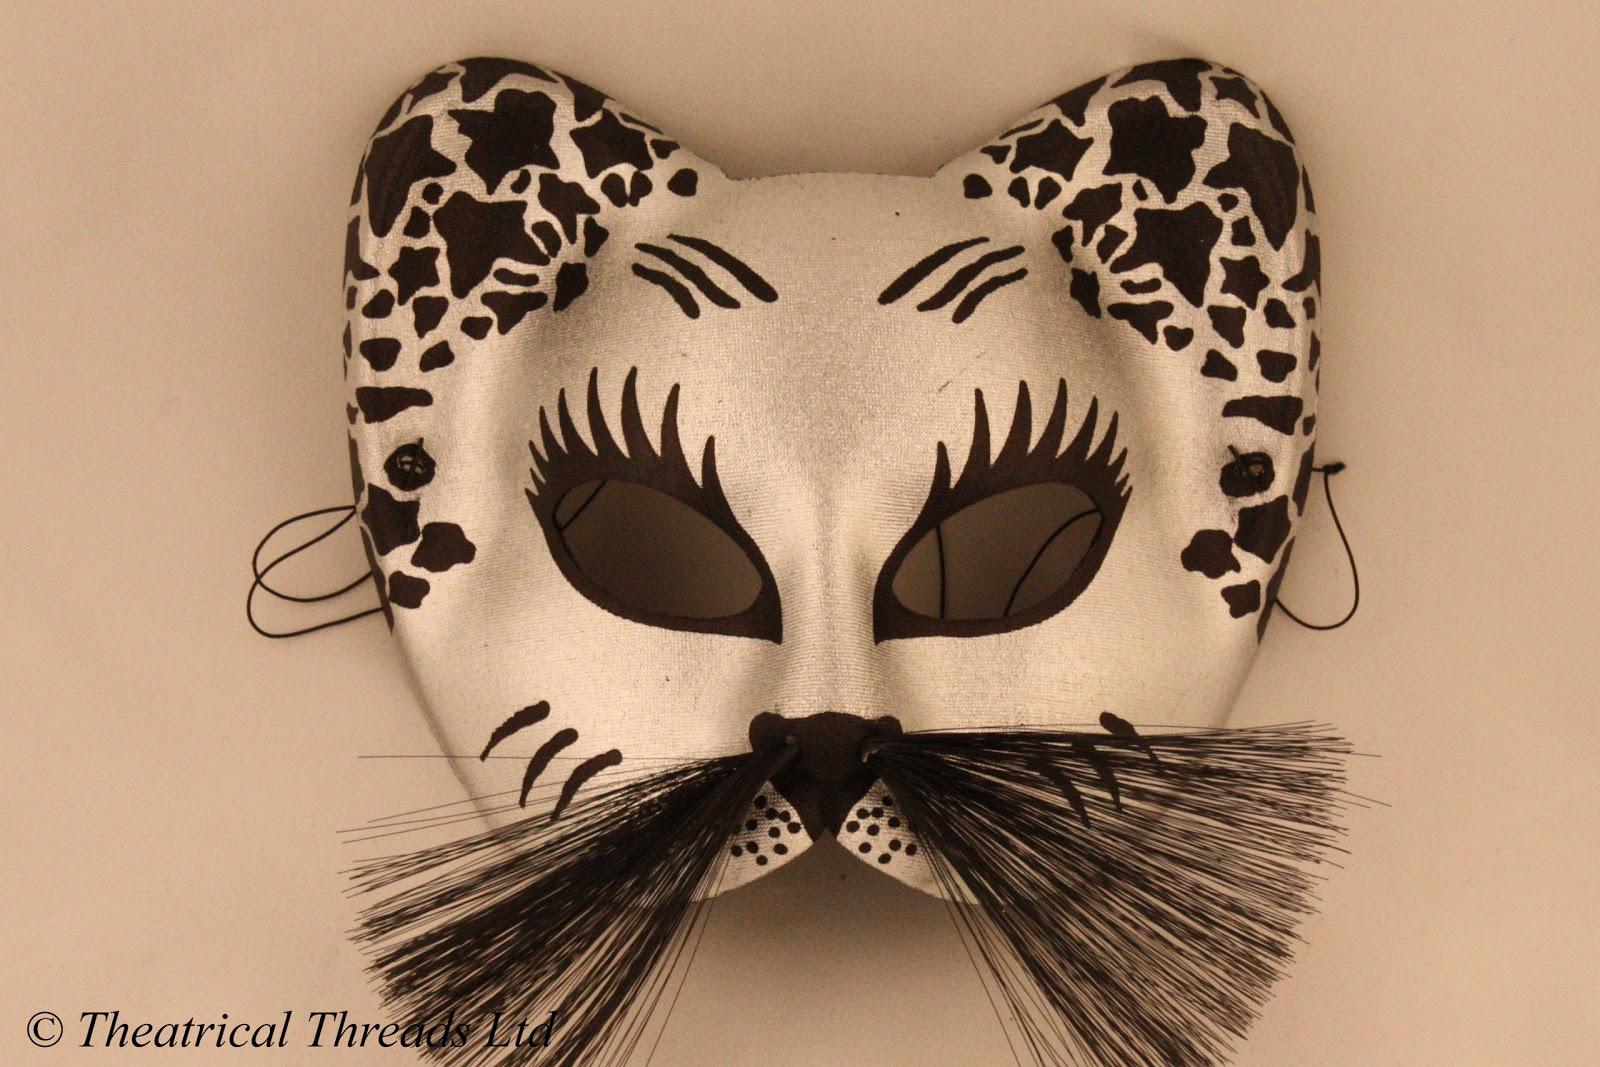 949ce5017fd0 Gattone Black & Silver Masquerade Ball Mask from Theatrical Threads Ltd